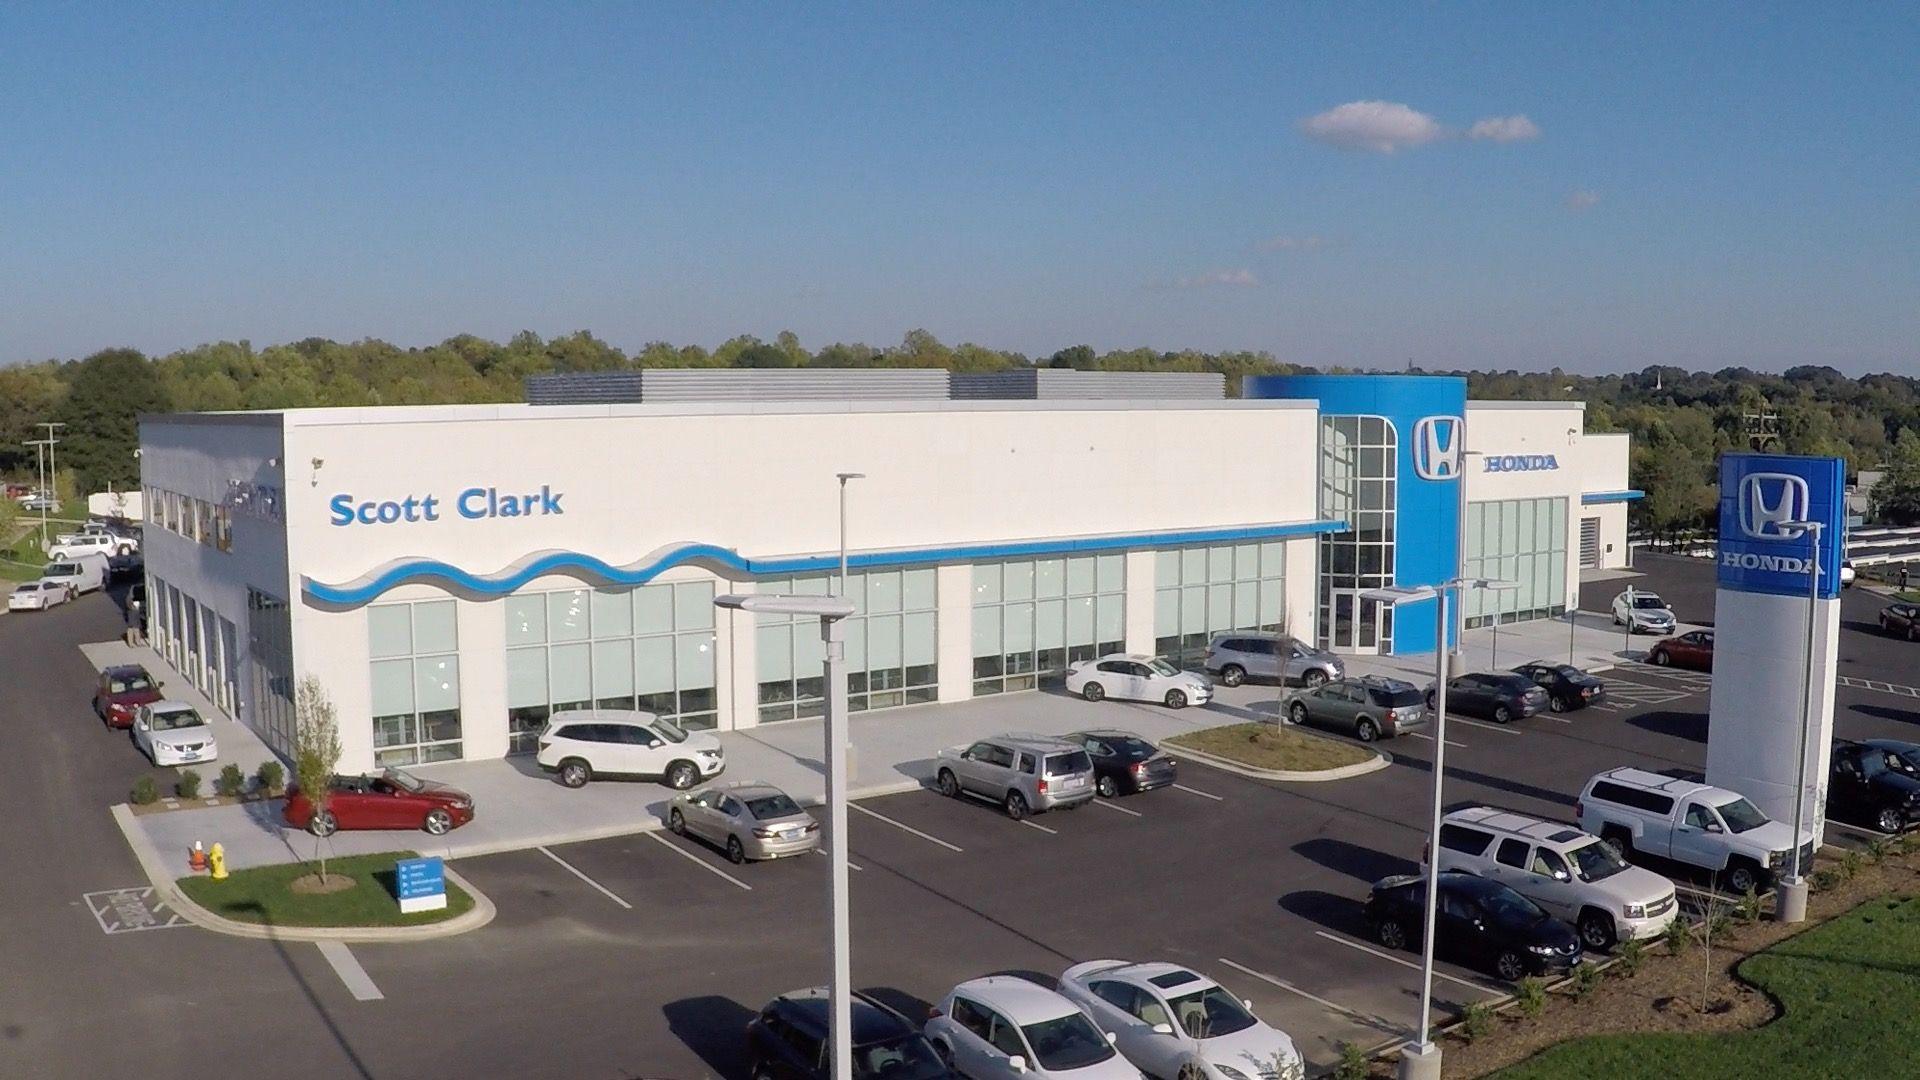 Lovely Experience Expert Honda Service In Charlotte, NC  Http://www.scottclarkhonda.com/service Department.html